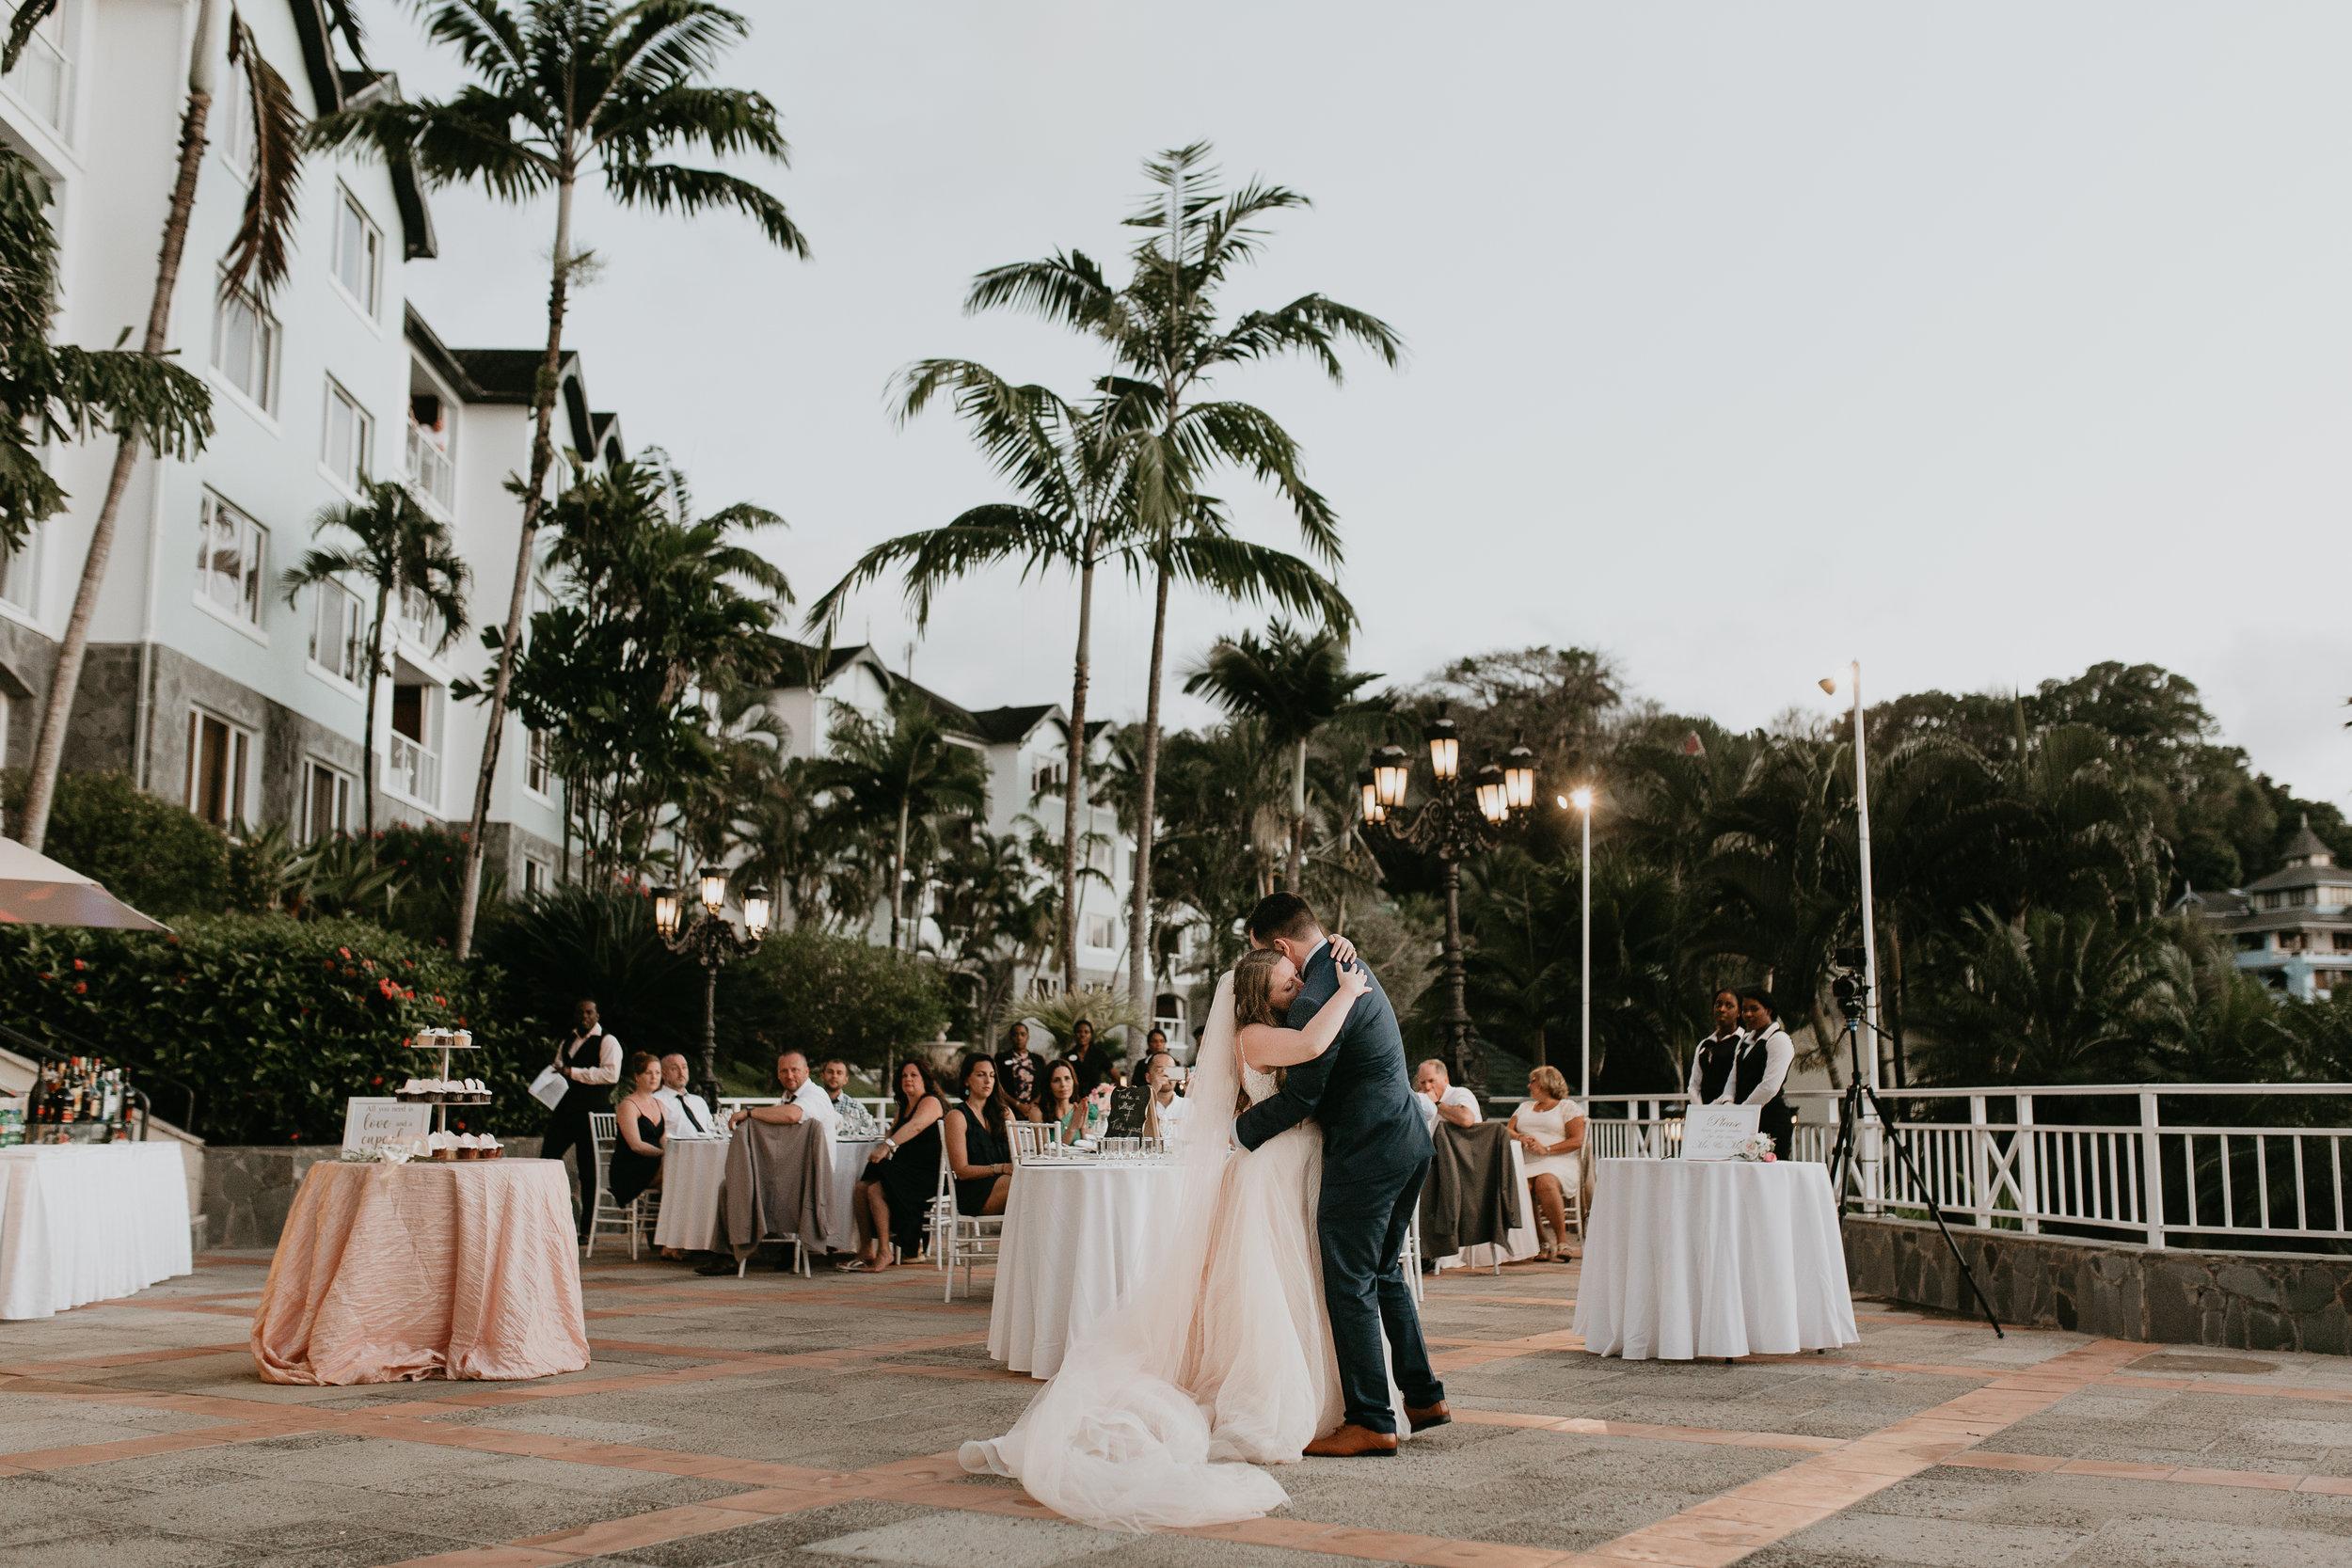 nicole-daacke-photography-destination-wedding-in-st-lucia-sandals-la-toc-intimate-island-wedding-carribean-elopement-photographer-chill-island-wedding-136.jpg